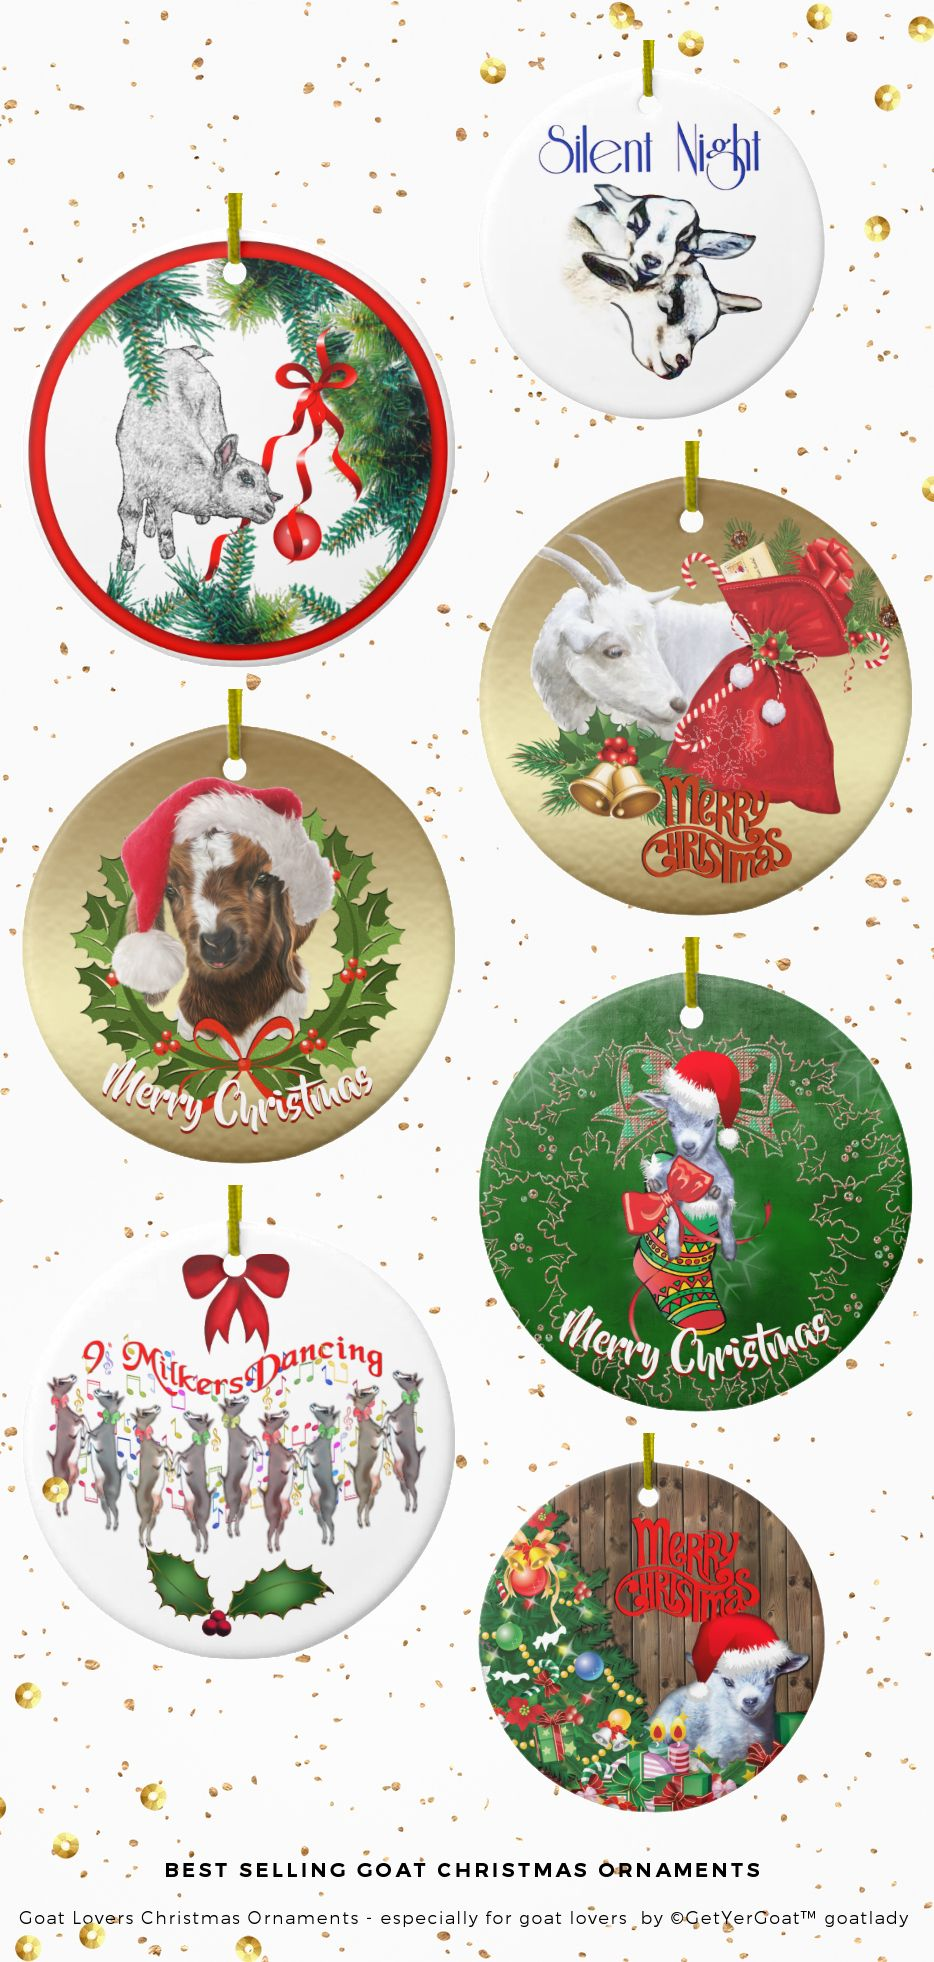 Goat Christmas Ornament.Best Selling Goat Christmas Ornaments Goat Lovers Christmas